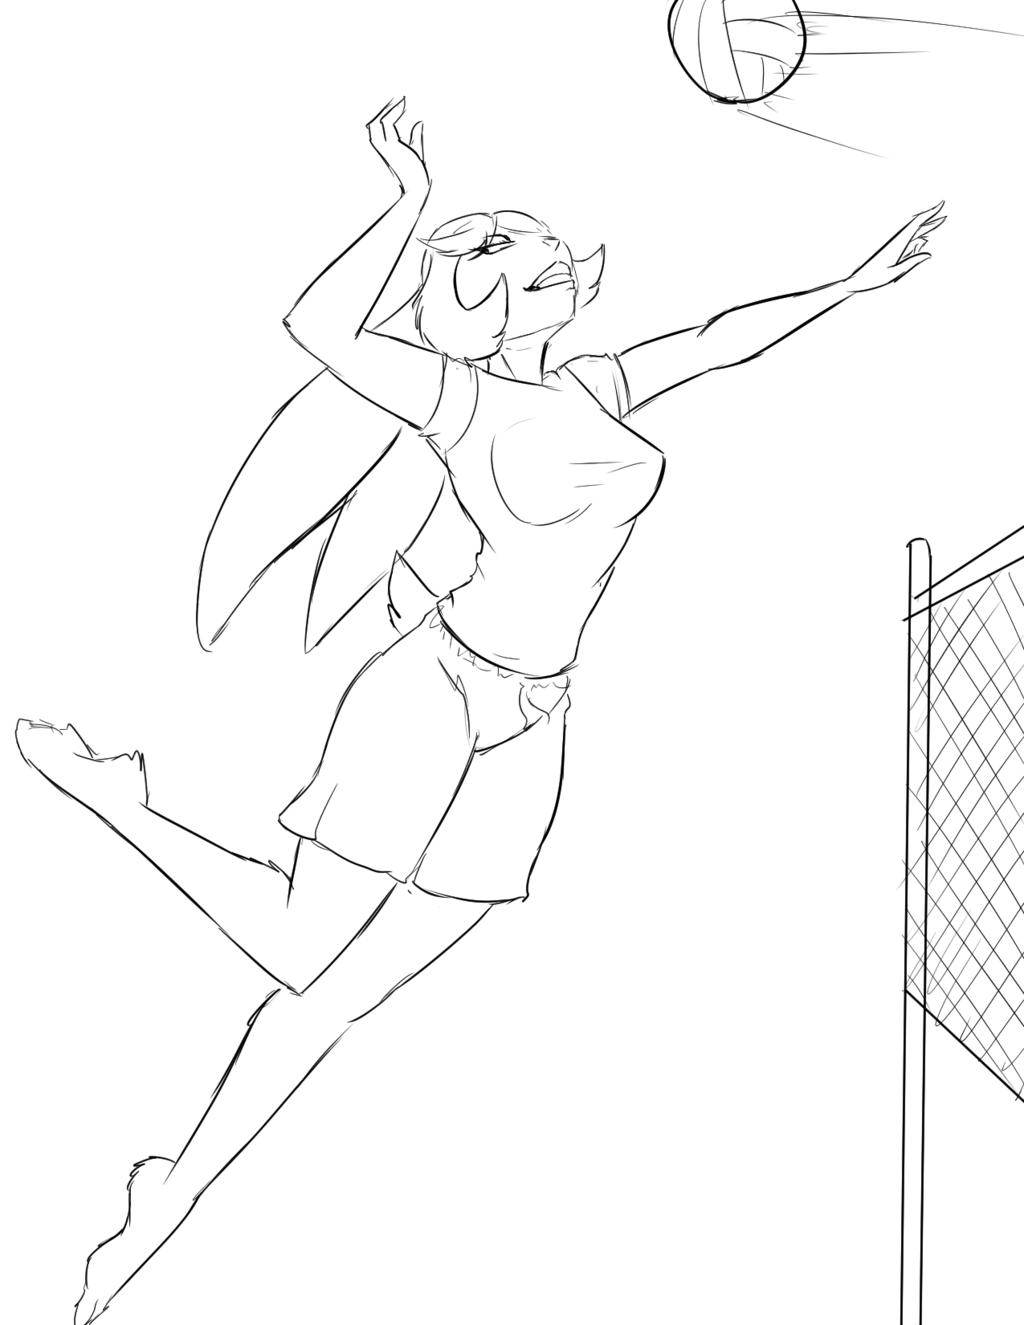 Volleyball TangoBunny!